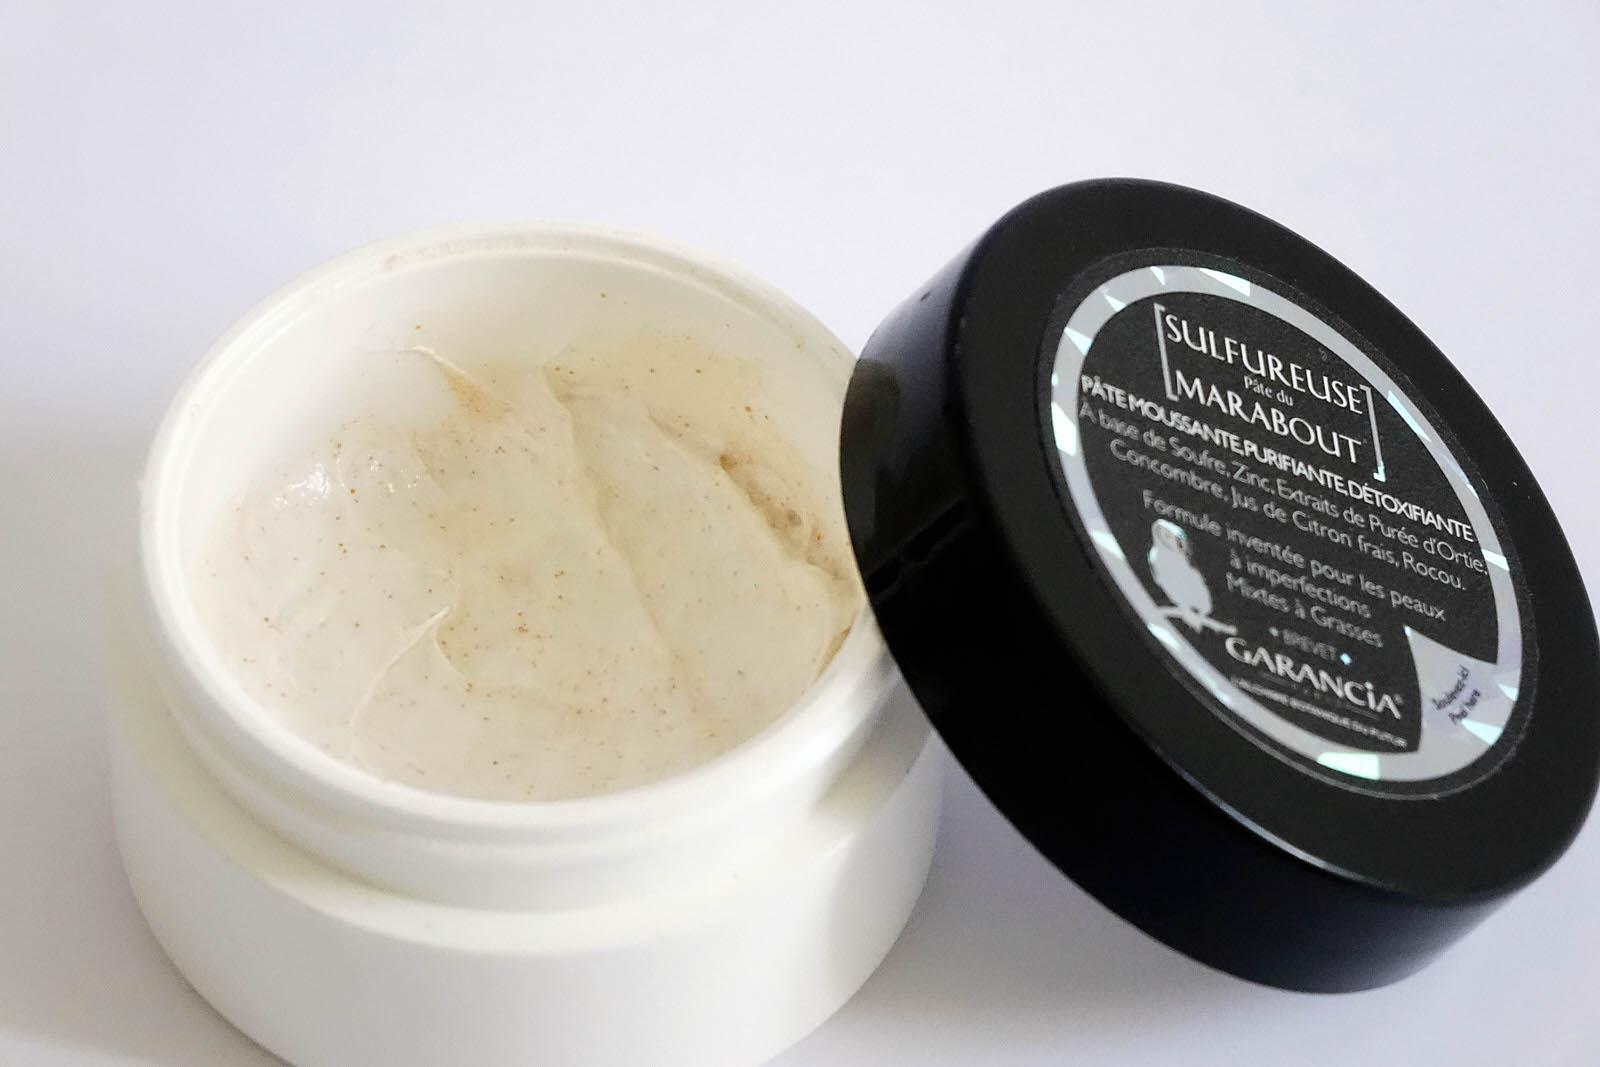 janise-en-sucre-garancia-routine-07-1